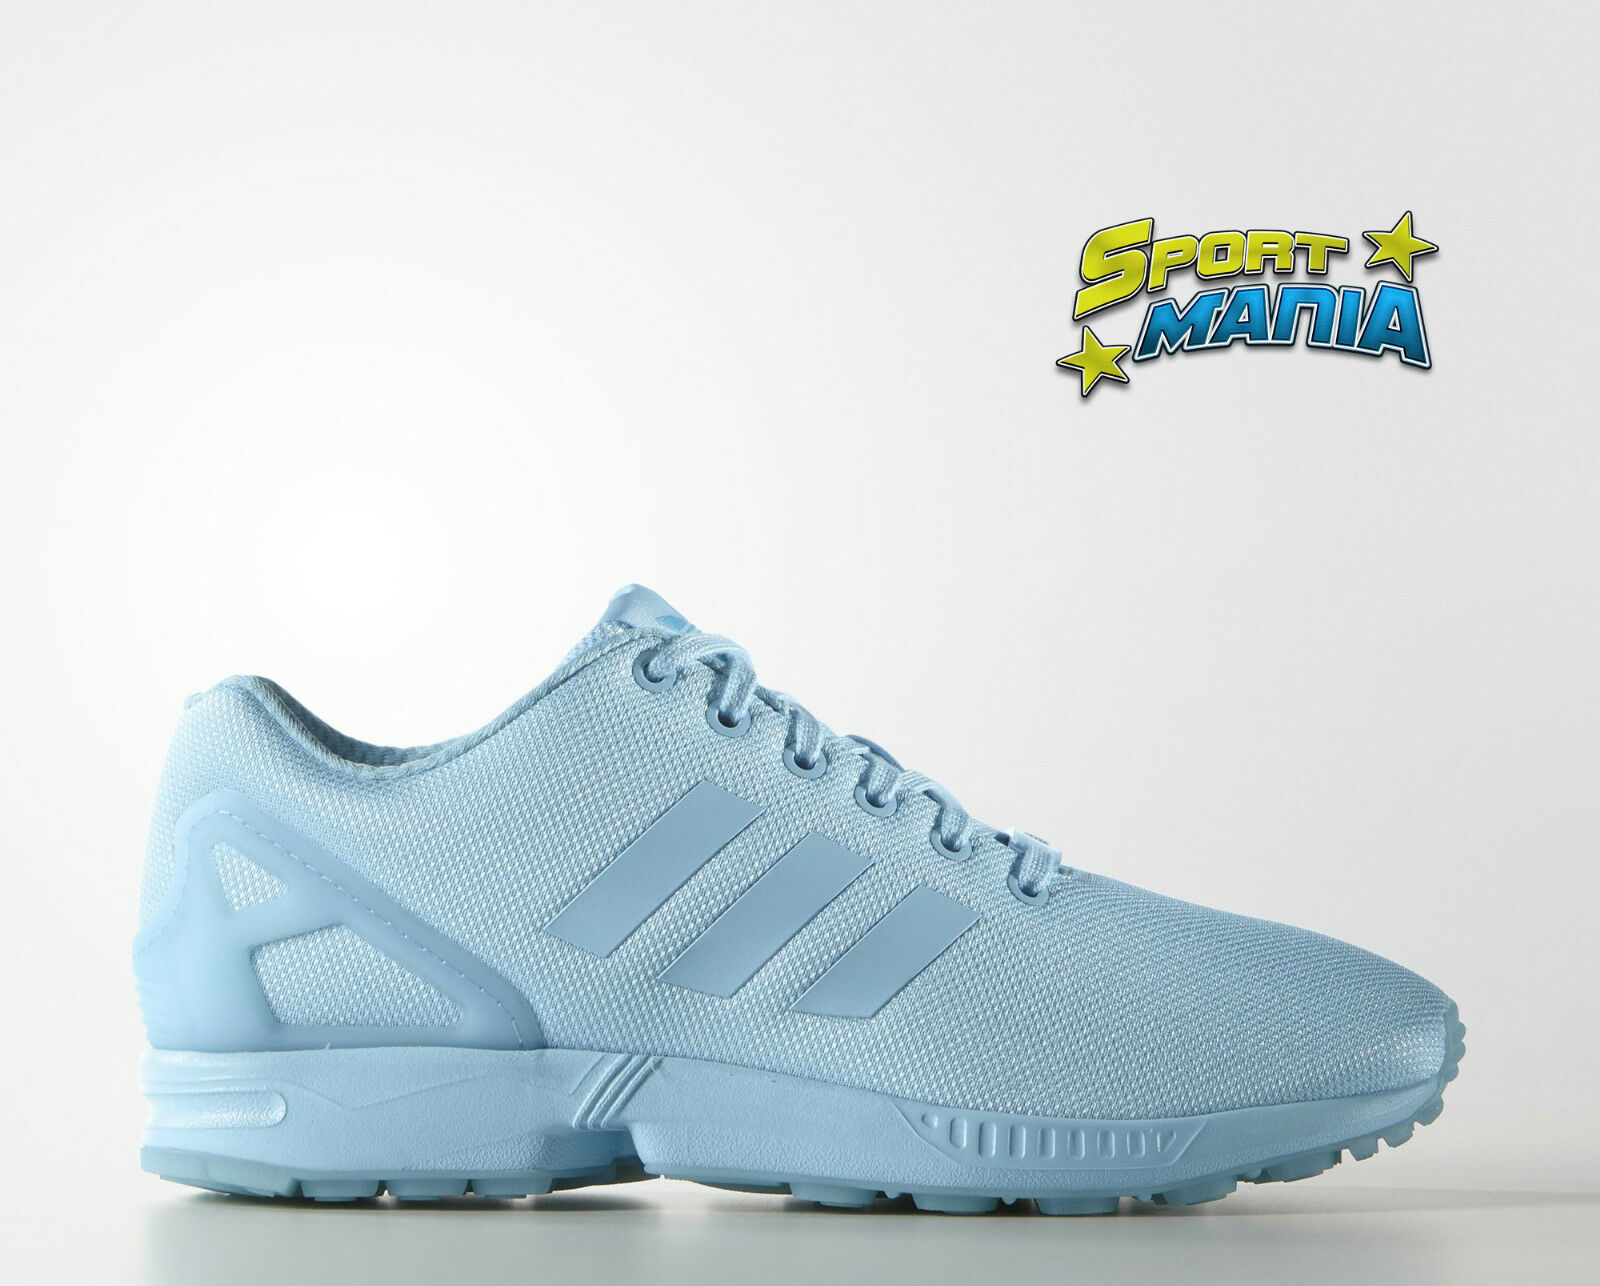 acheter populaire 1edec 73c1c Adidas Adidas Adidas Zx Flux Celeste Azzurra Sportive ...